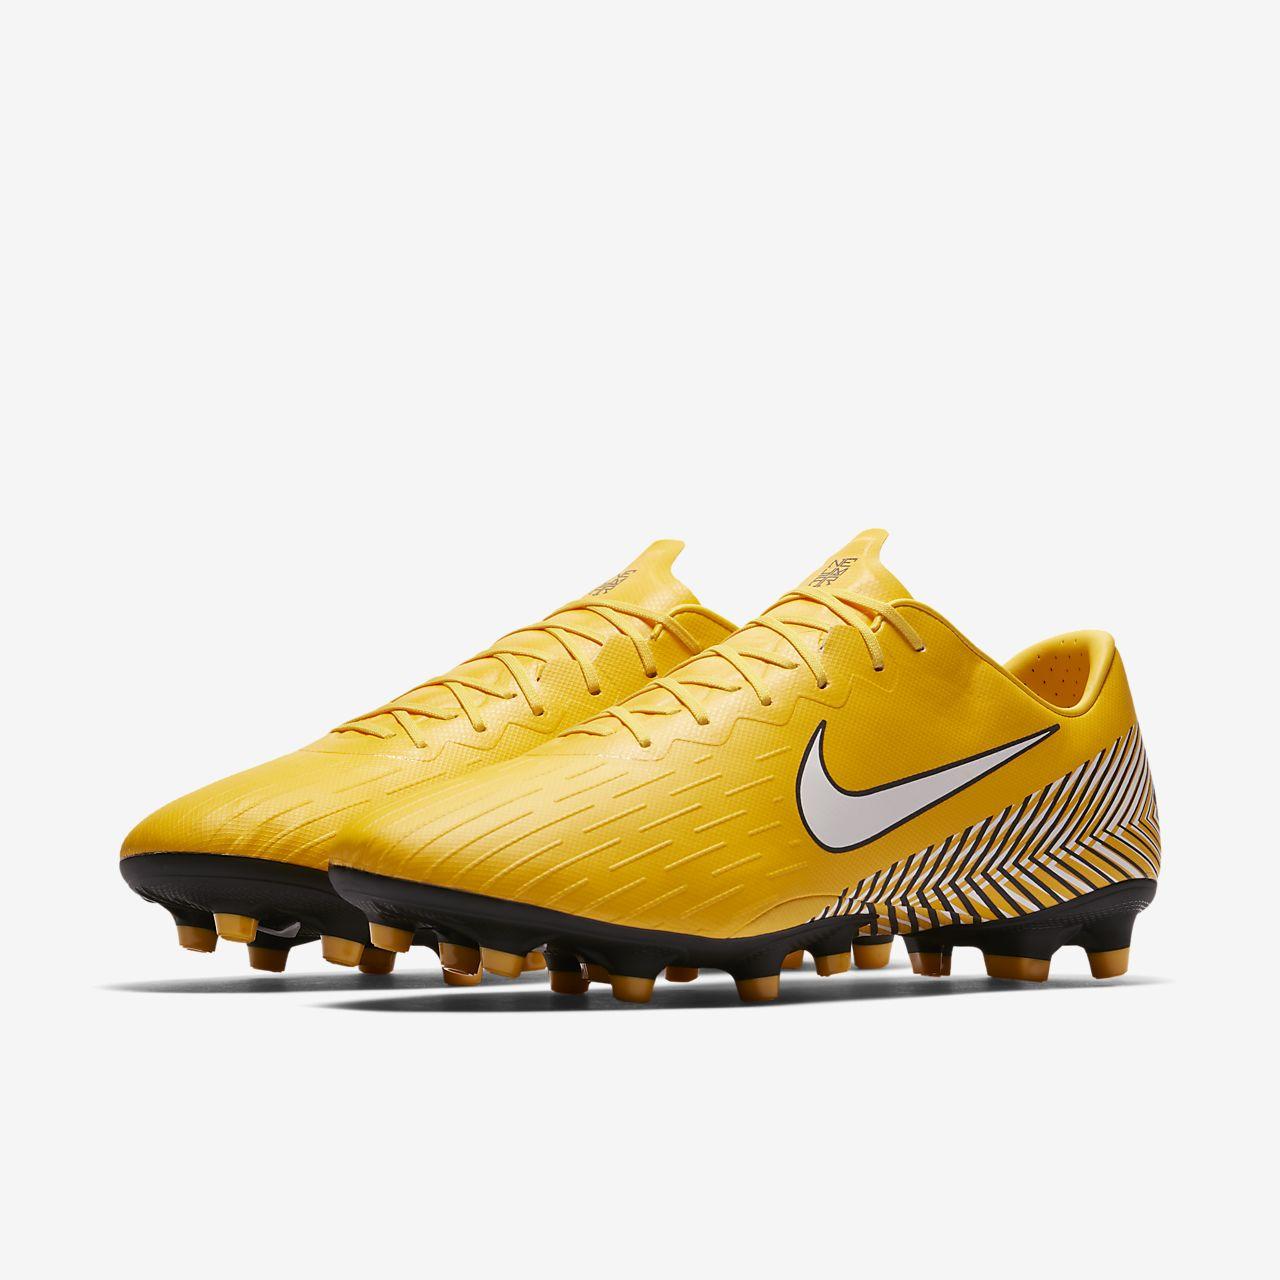 Nike Mercurial Vapor XII Pro Neymar AG-PRO Fußballschuh für Kunstrasen